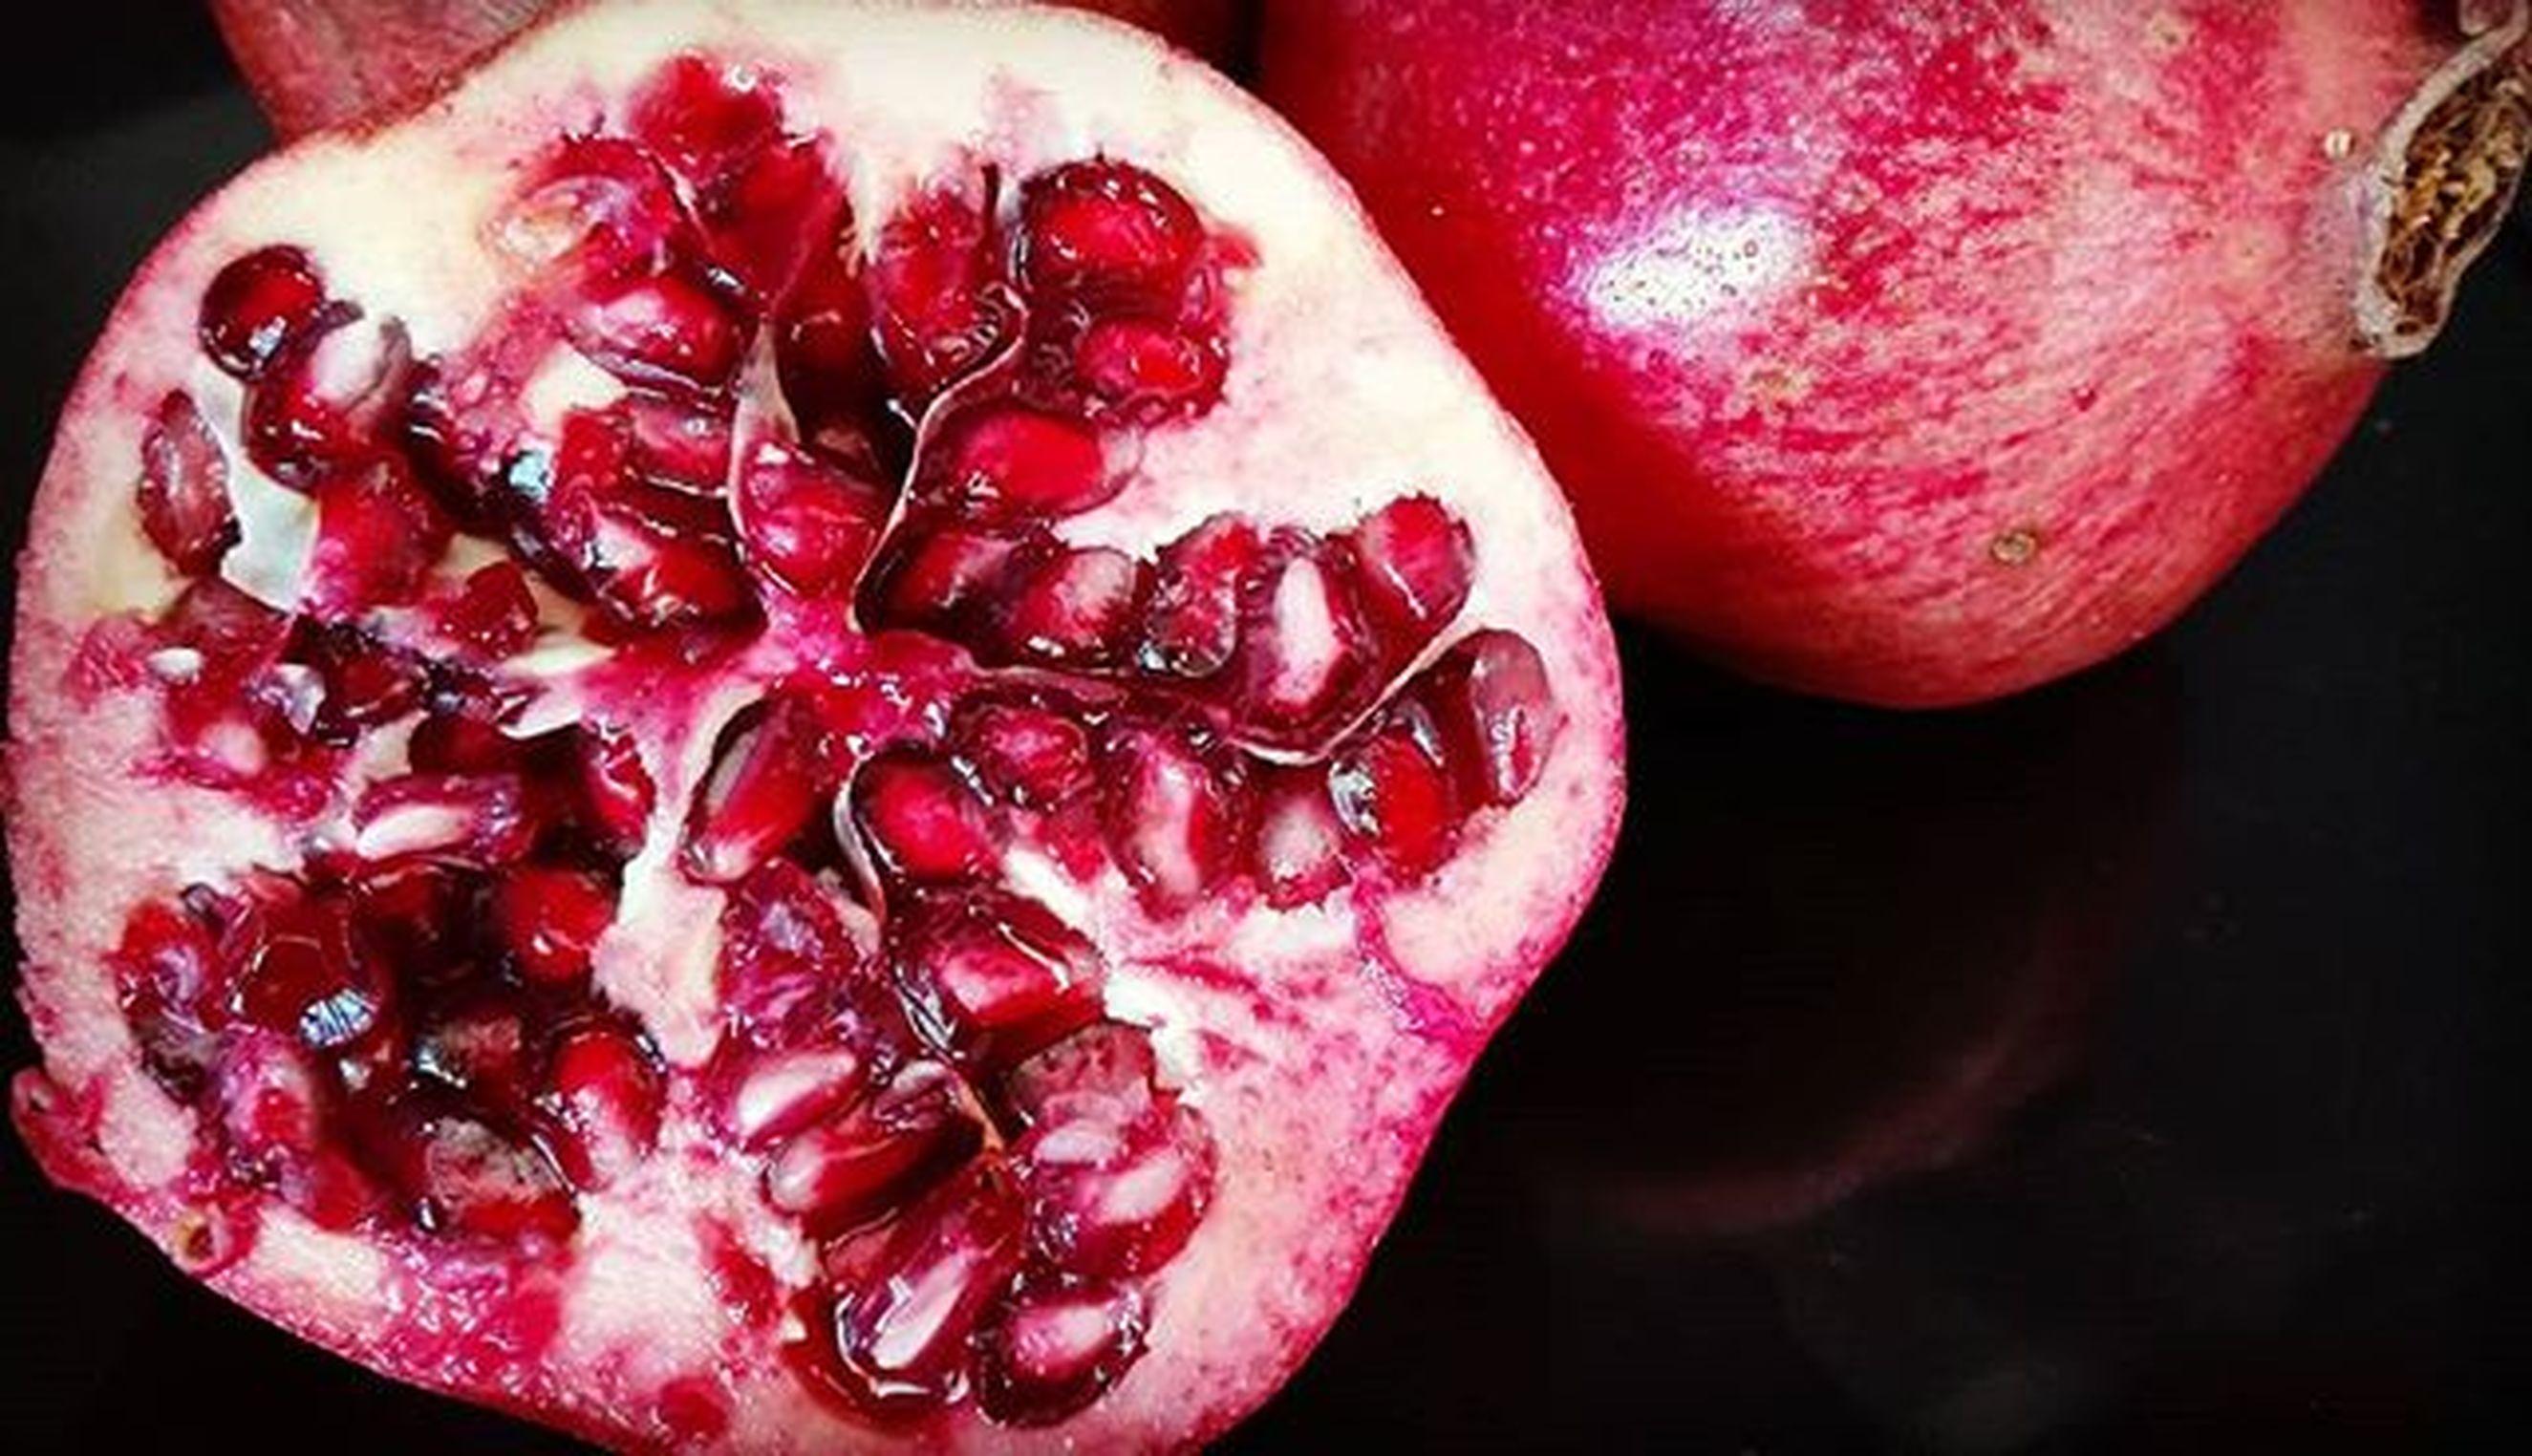 Pomegranate Pomegranates  Fruit Food Huarakau Red Ruby Maroon Crimson Changingplate Perséphone Fyp_minimac_bbg Fyp_macrofood 9Vaga_ColorRed9 9vaga_letterp9 Hello_red